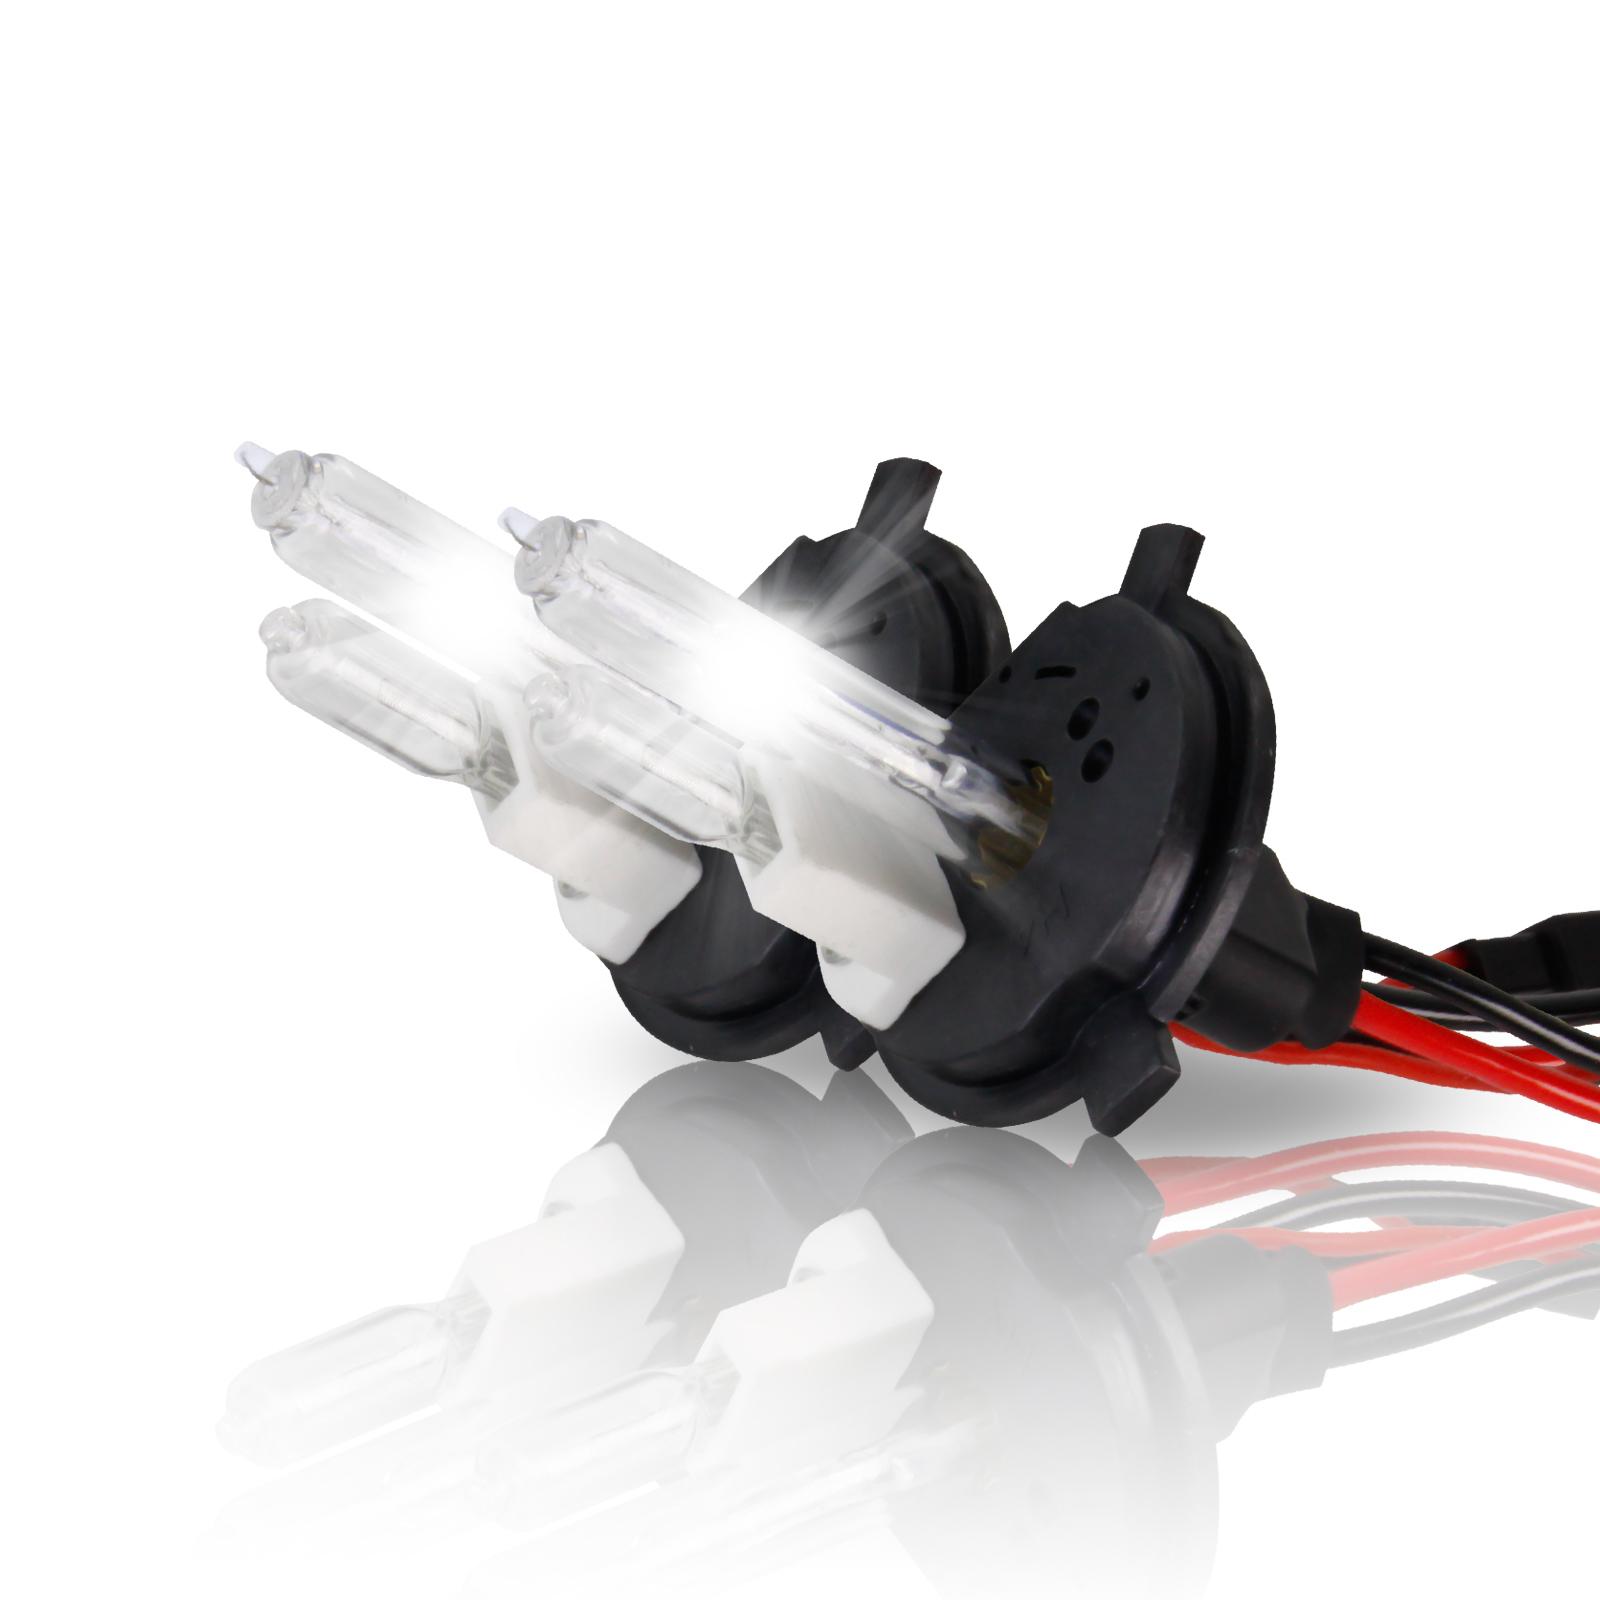 Project RA 35W H4 6000K Xenon White HID Headlight Bulbs - 9003 Hi / Low HID Replacement Bulbs - Pair